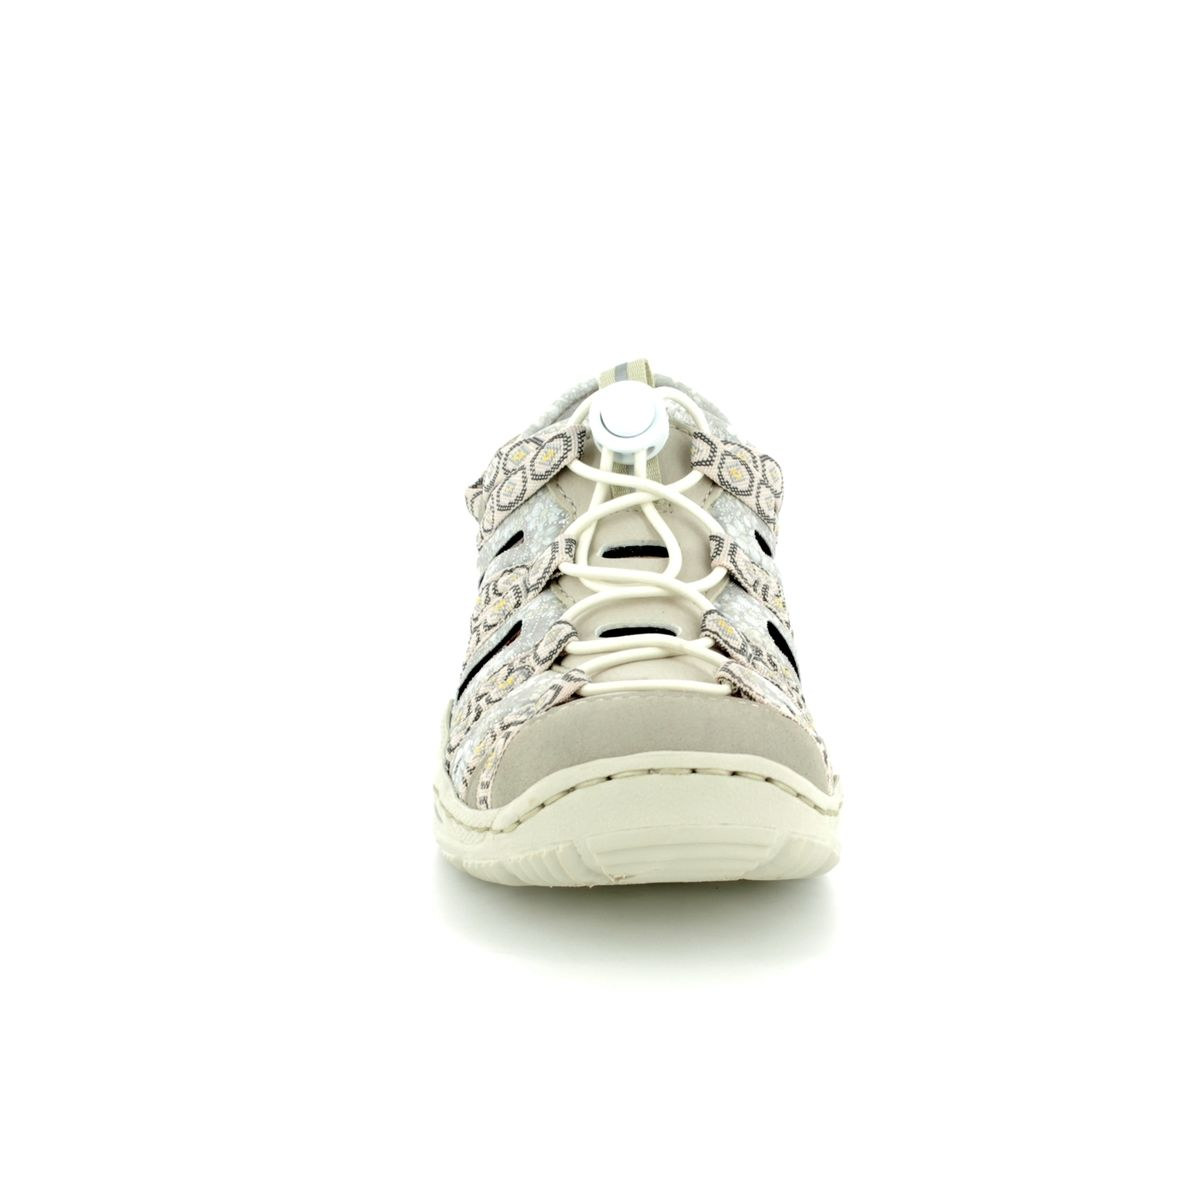 cb8b70ce4c9b Rieker Closed Toe Sandals - Beige multi - L0577-60 JEERSY